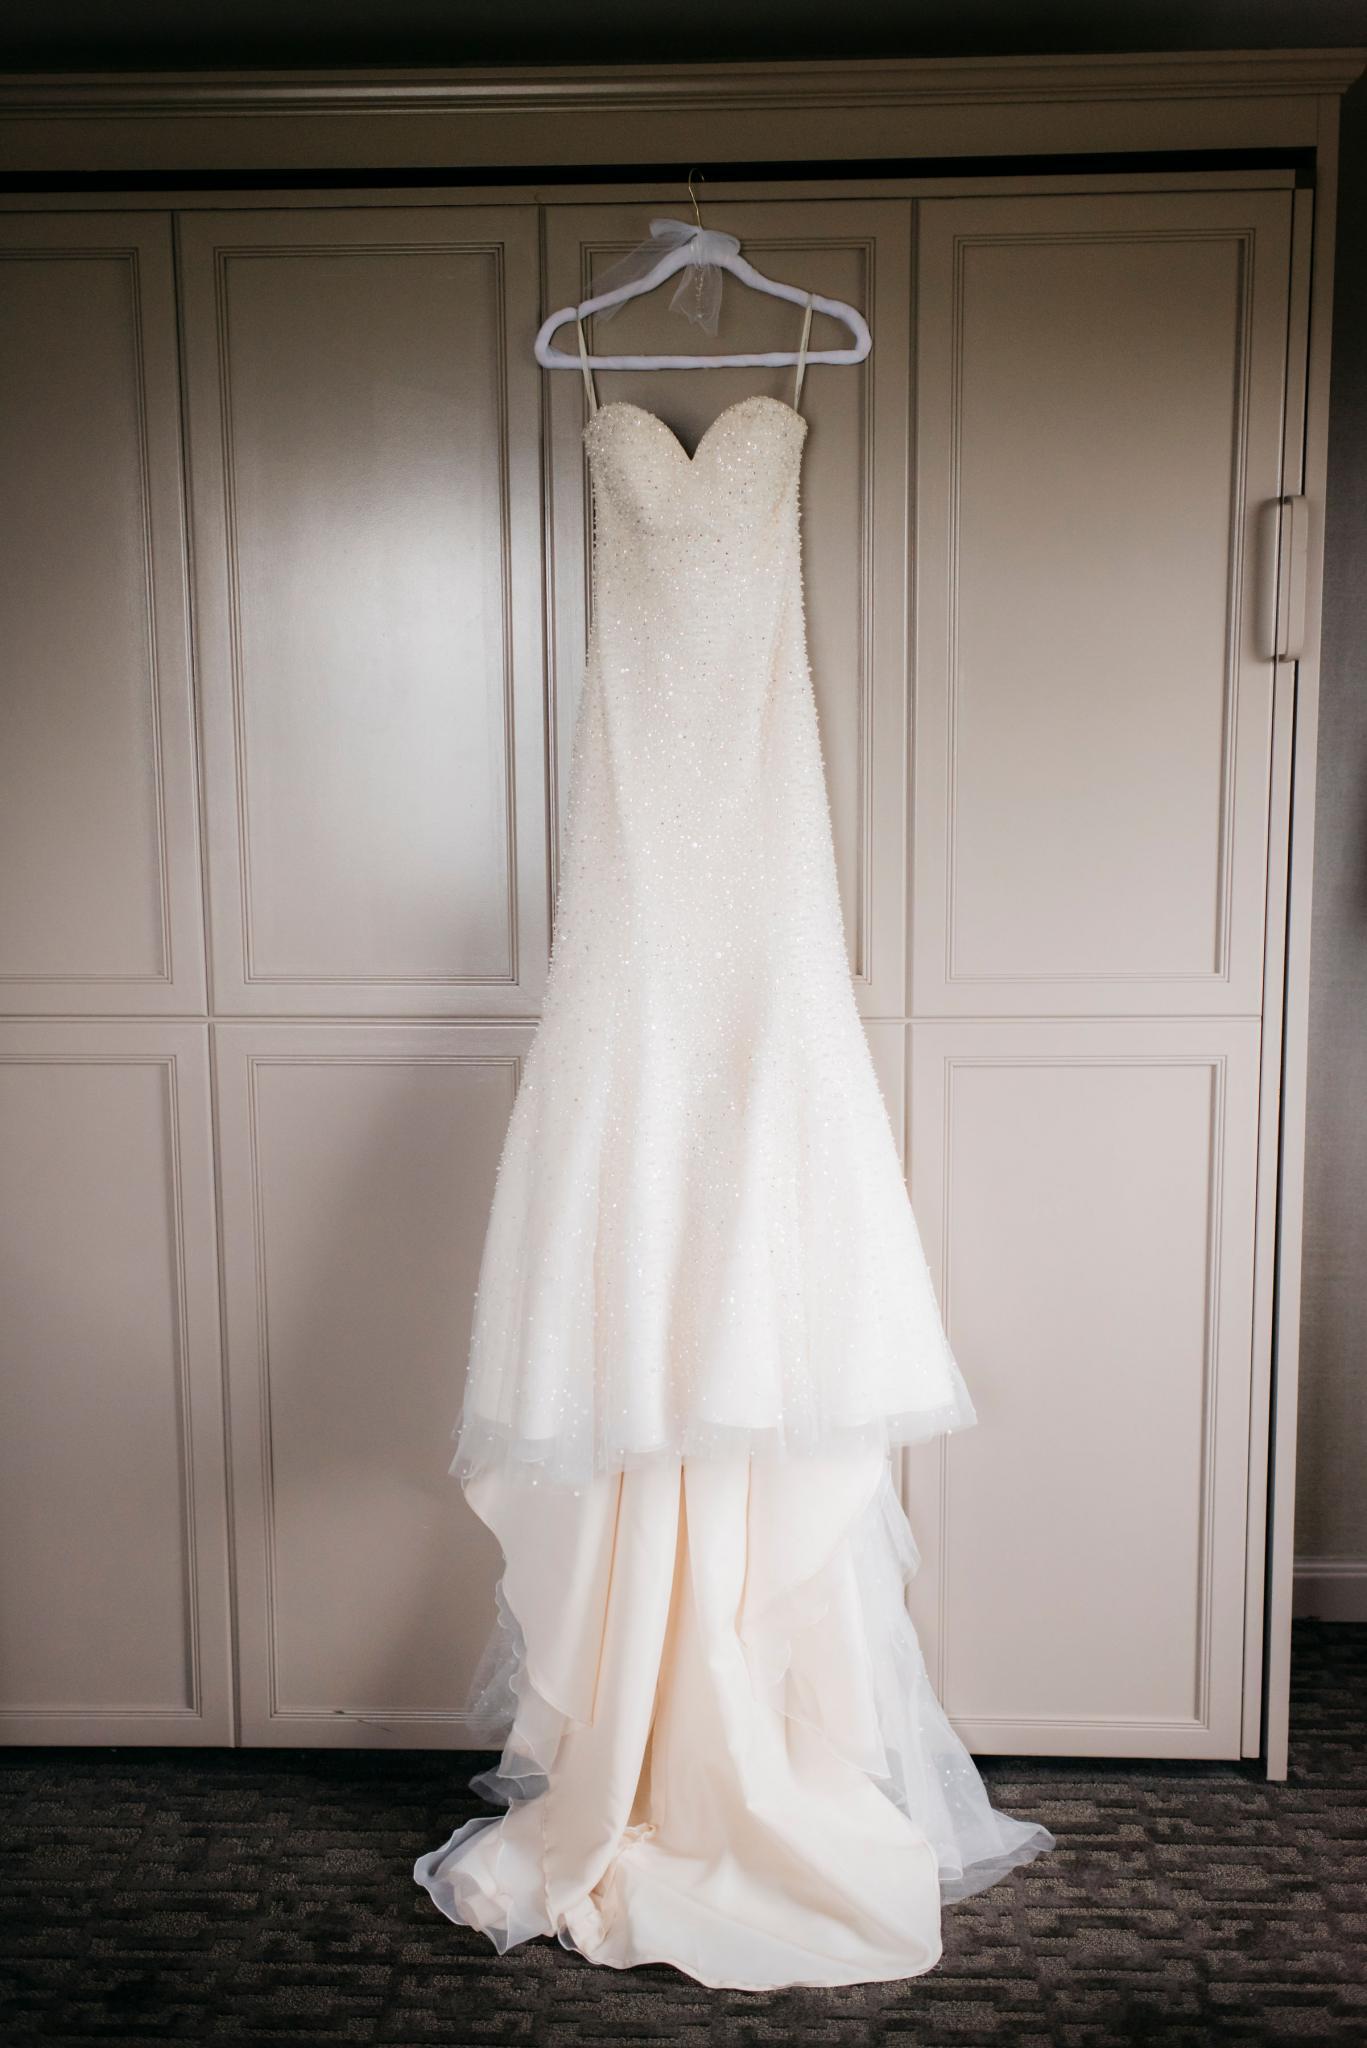 annie tommy venue SIX10 chicago, il wedding dress